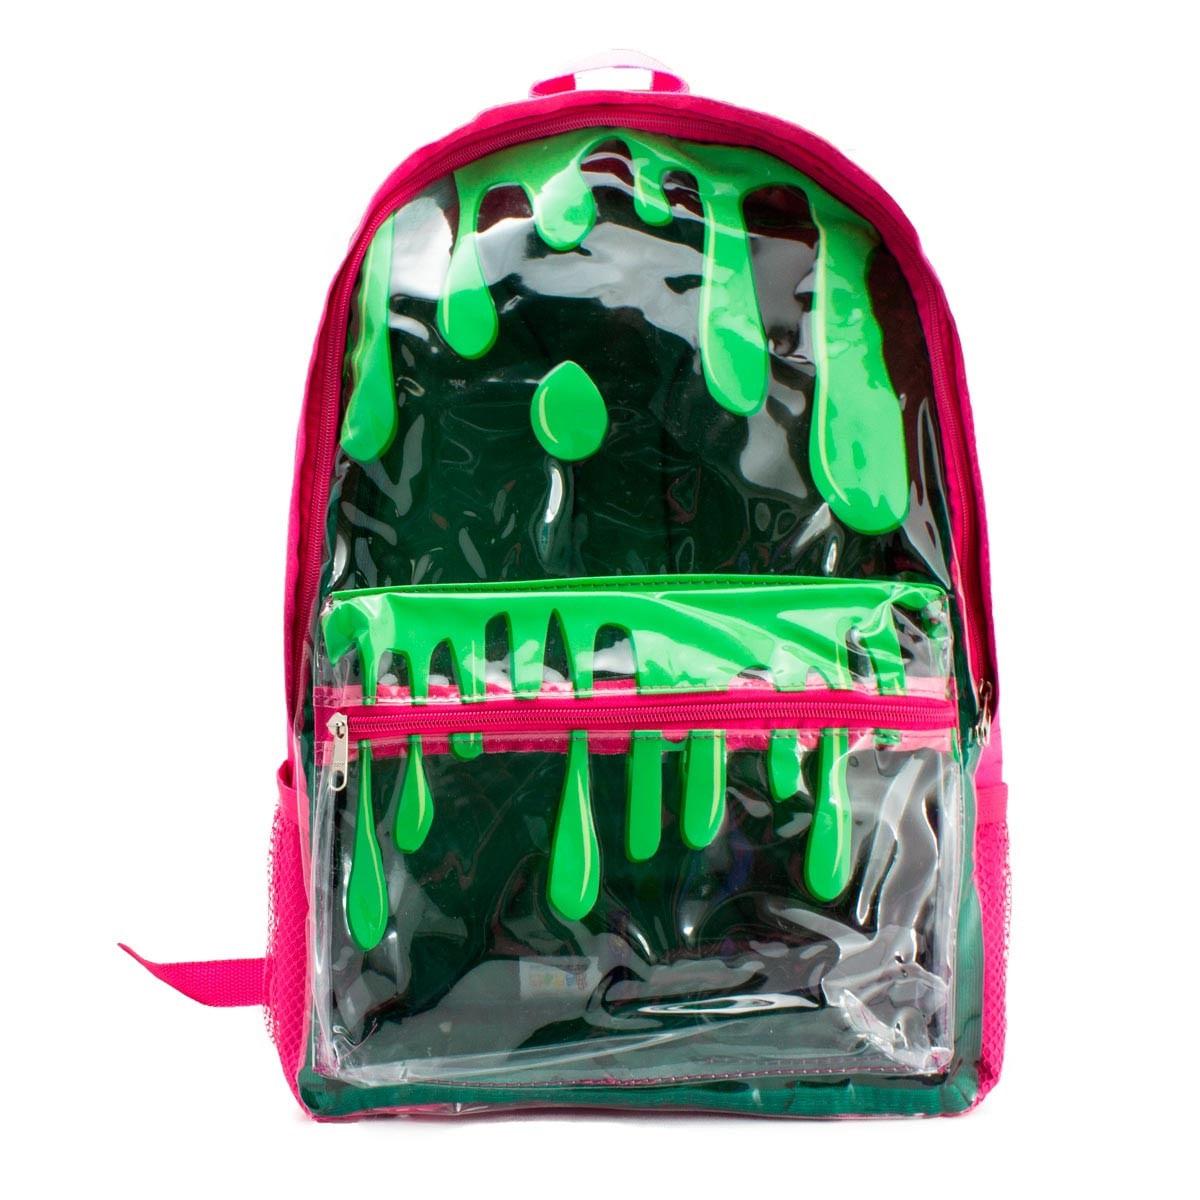 Mochila-Infantil-Slime-Escolar-Ludique-et-Badin